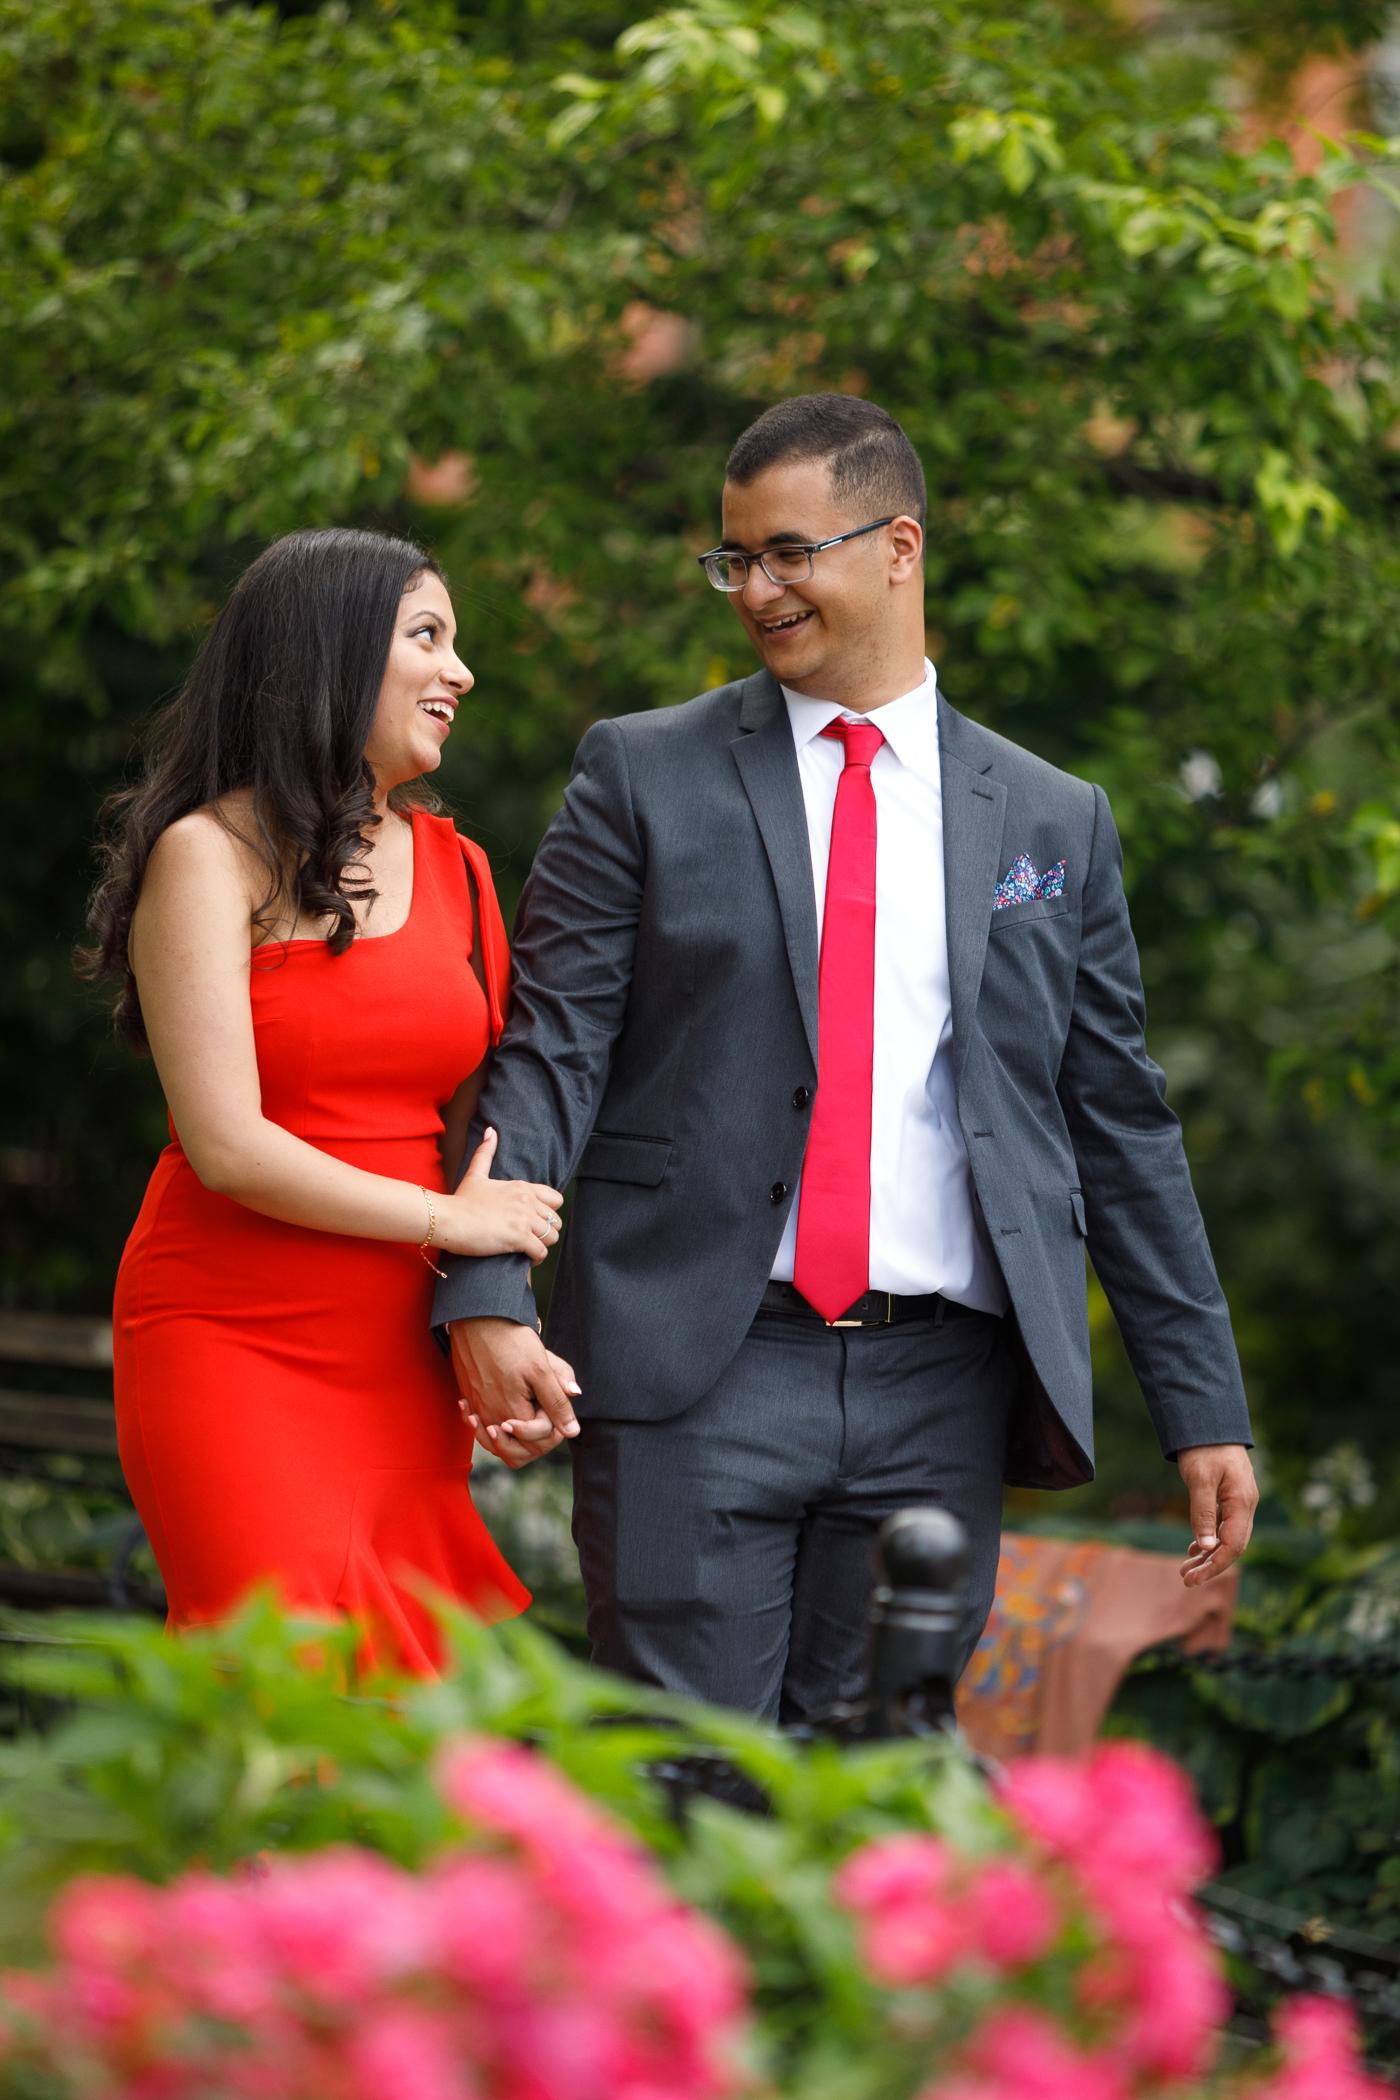 Kiro Rebecca Washington Square Park Marriage Proposal _ Jonathan Heisler _ 6152019 _040.jpg